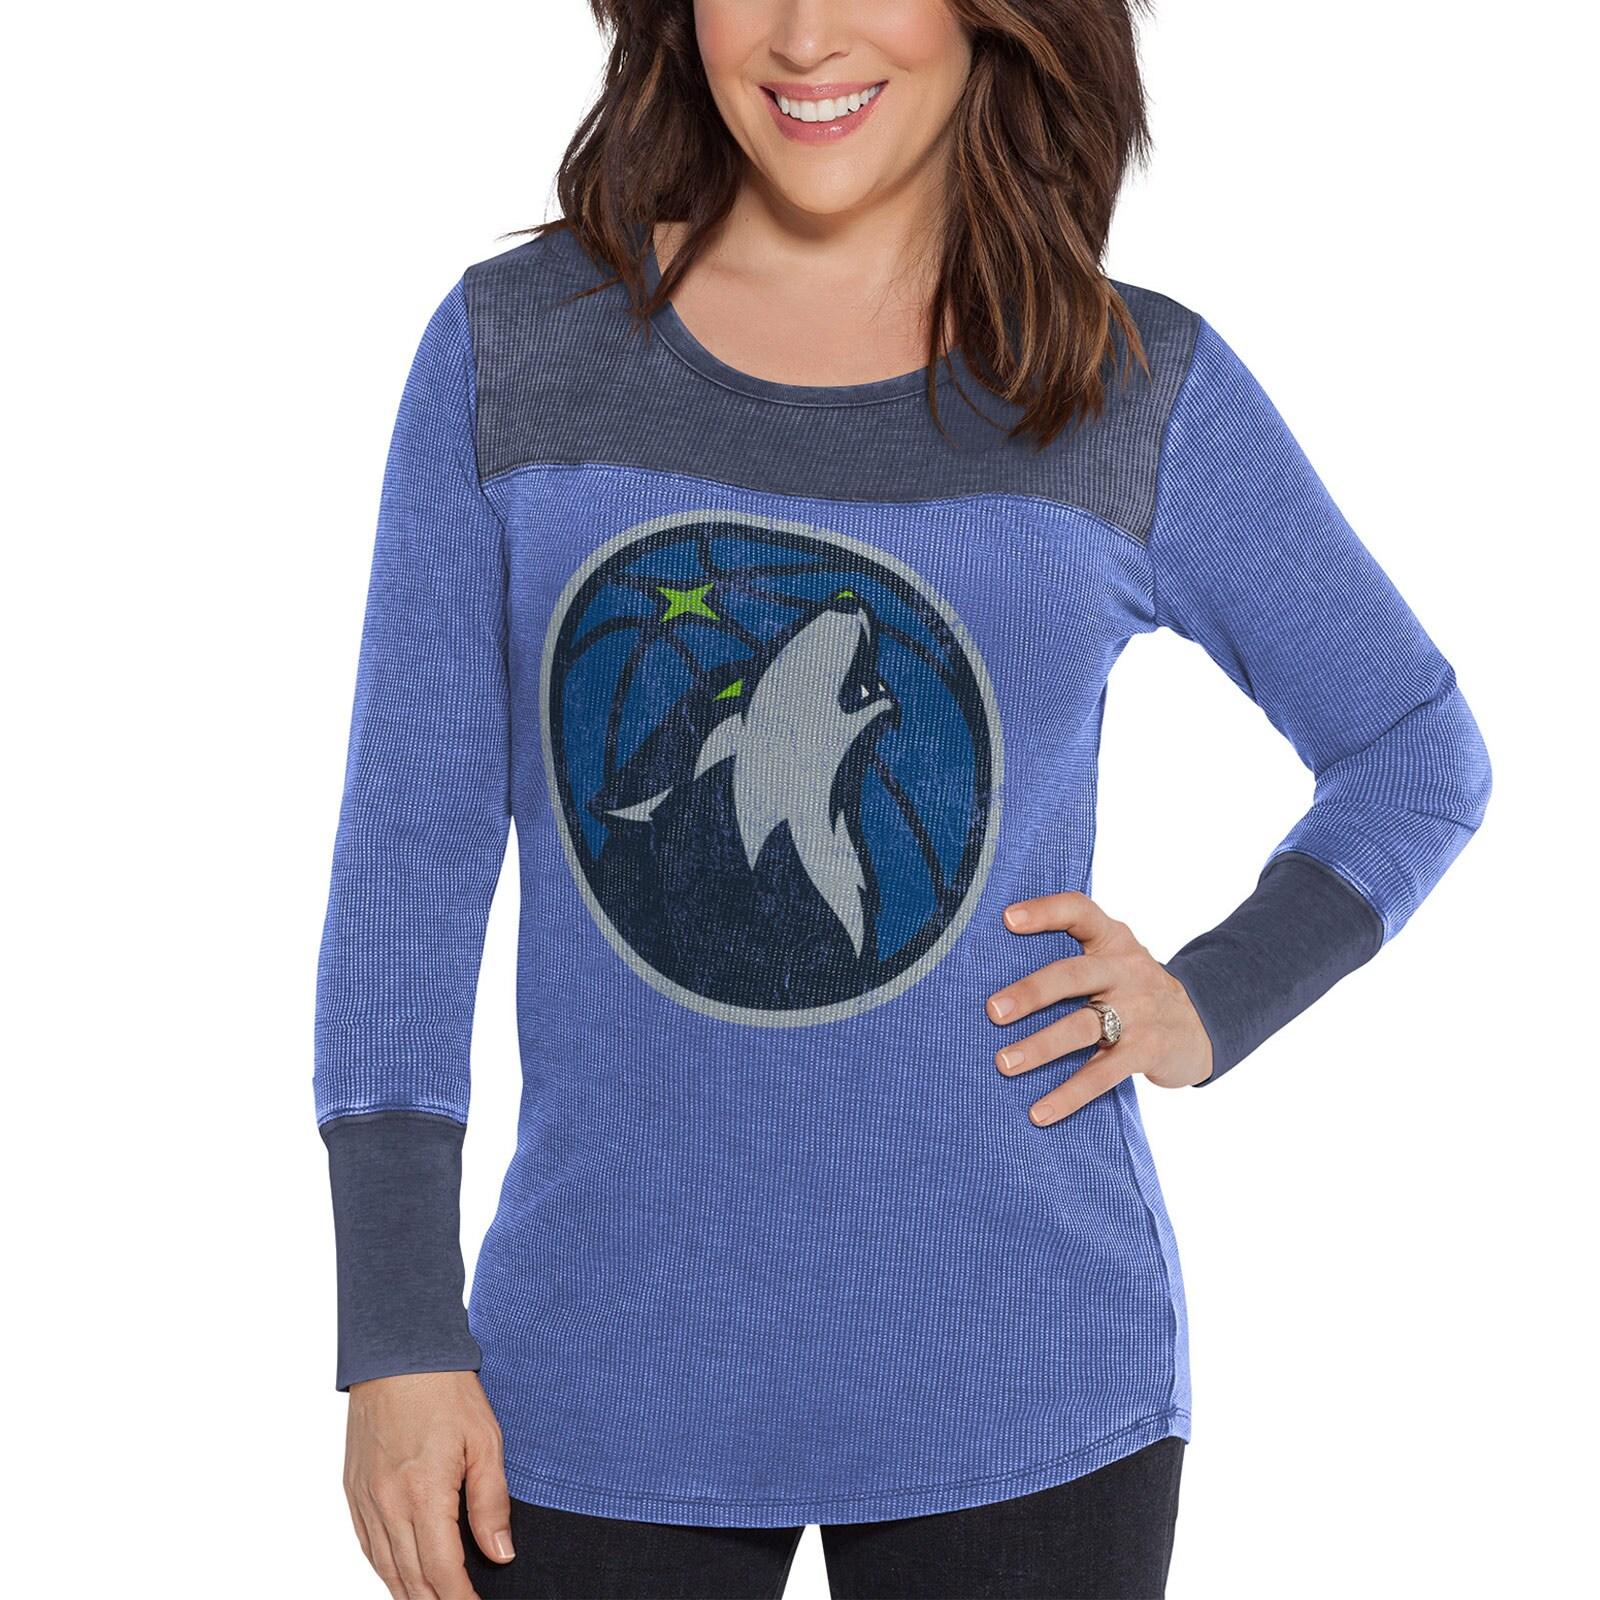 Minnesota Timberwolves G-III Sports by Carl Banks Women's Blindside Long Sleeve Thermal T-Shirt - Blue/Black